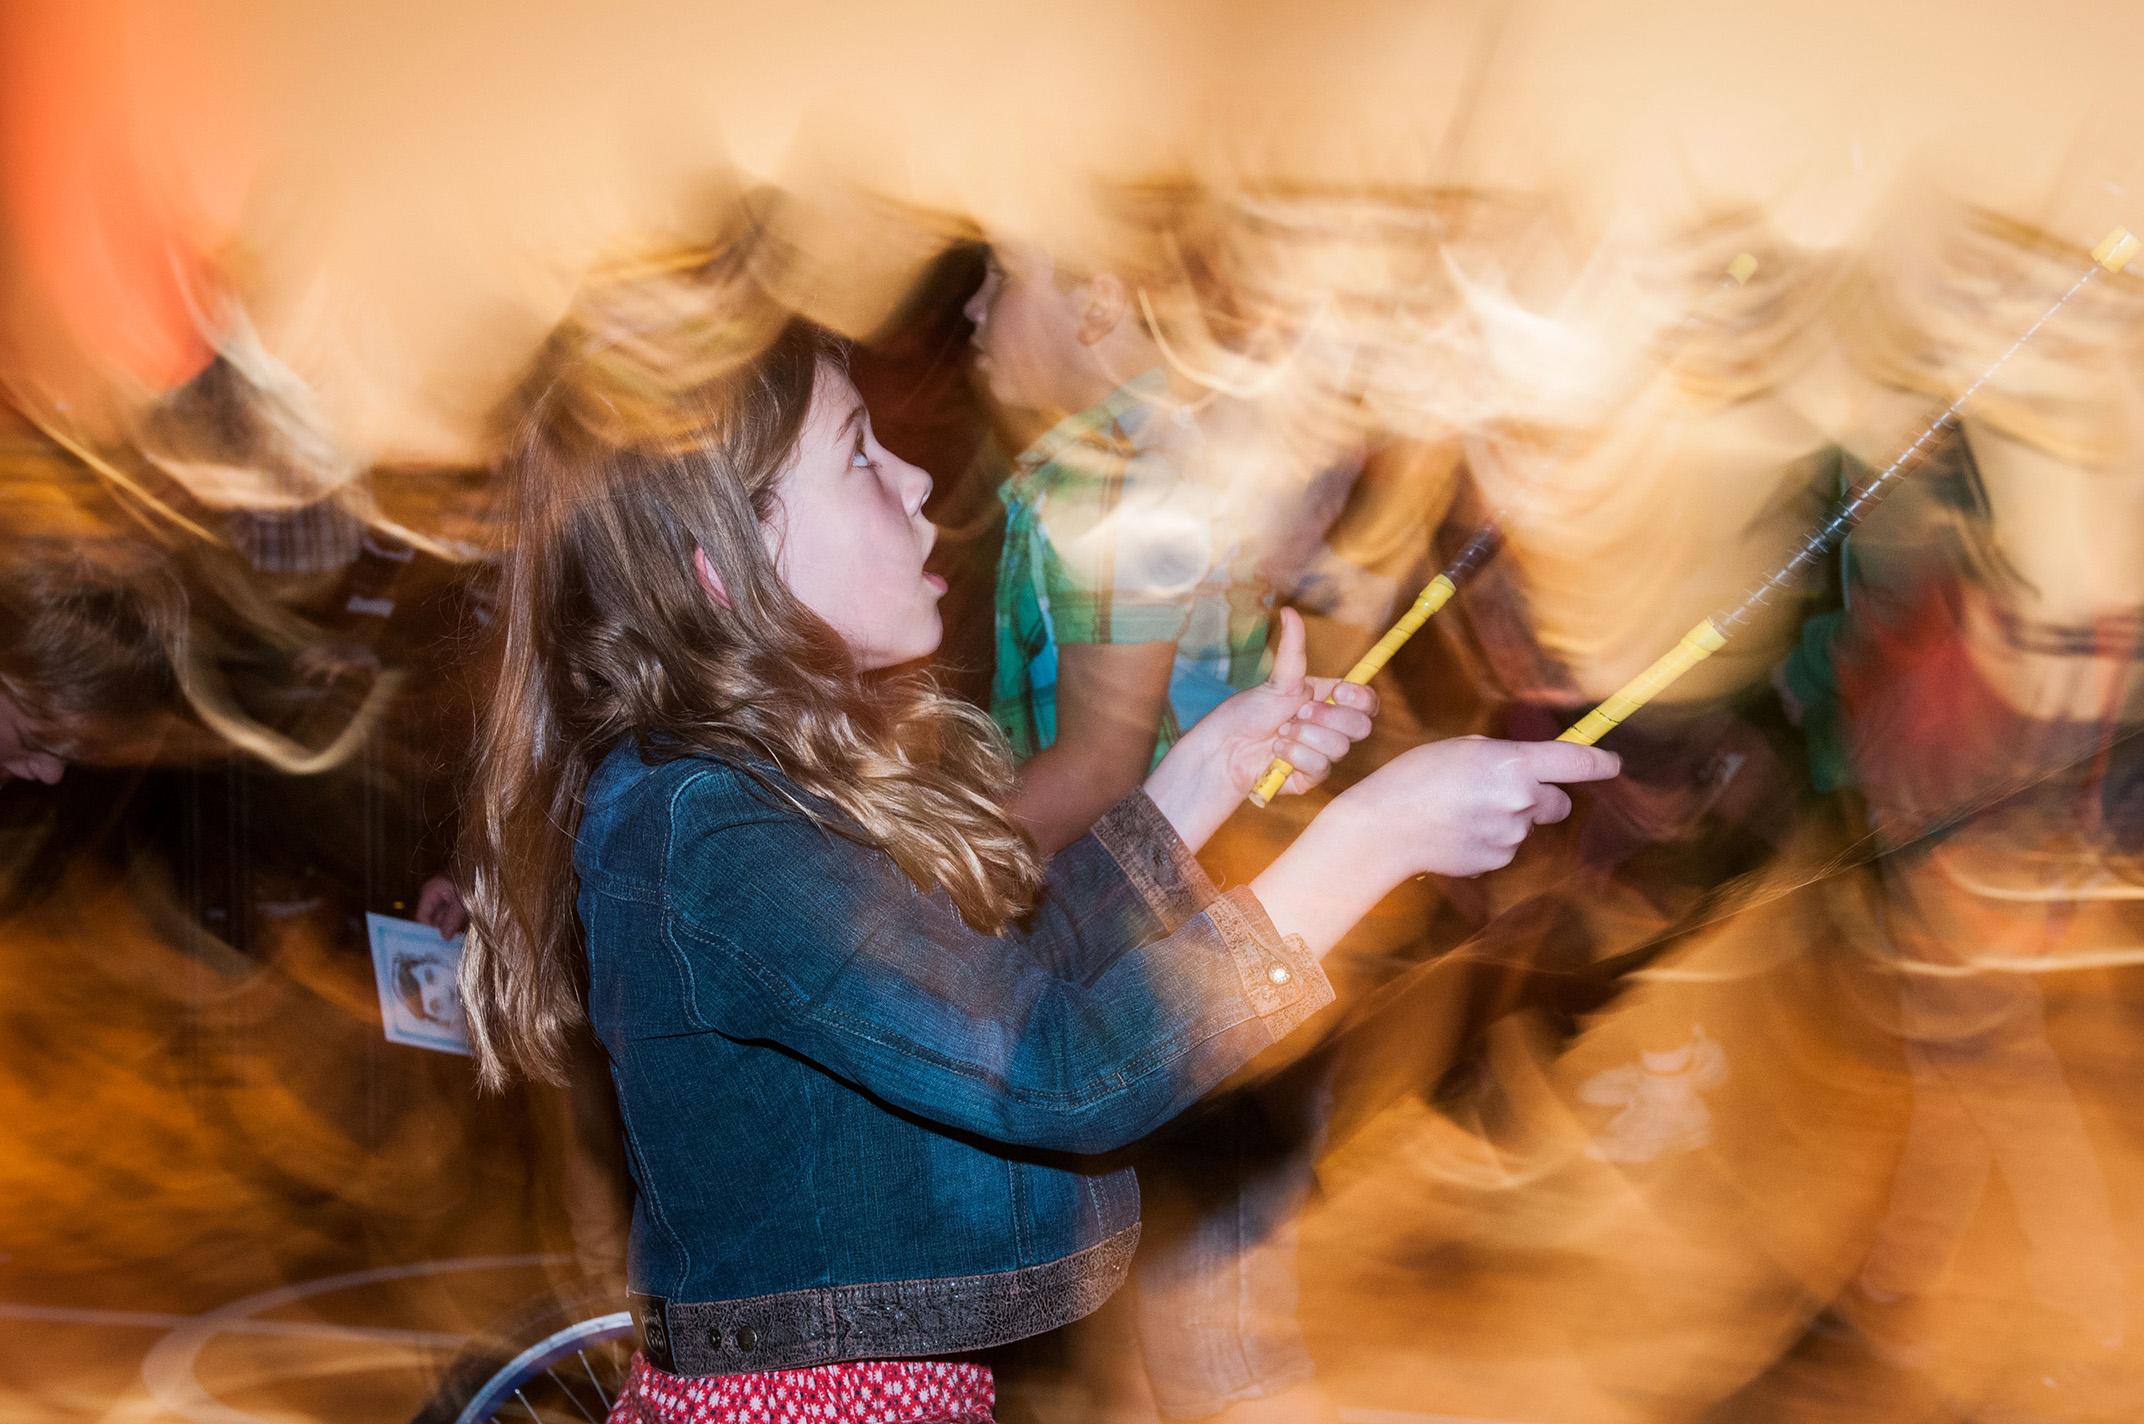 Juggle Kadimah jewish school in Auckland city 108 Greys Ave Auckland. Izaac Bar Mitzvah celebration photographed by Anais Chaine.